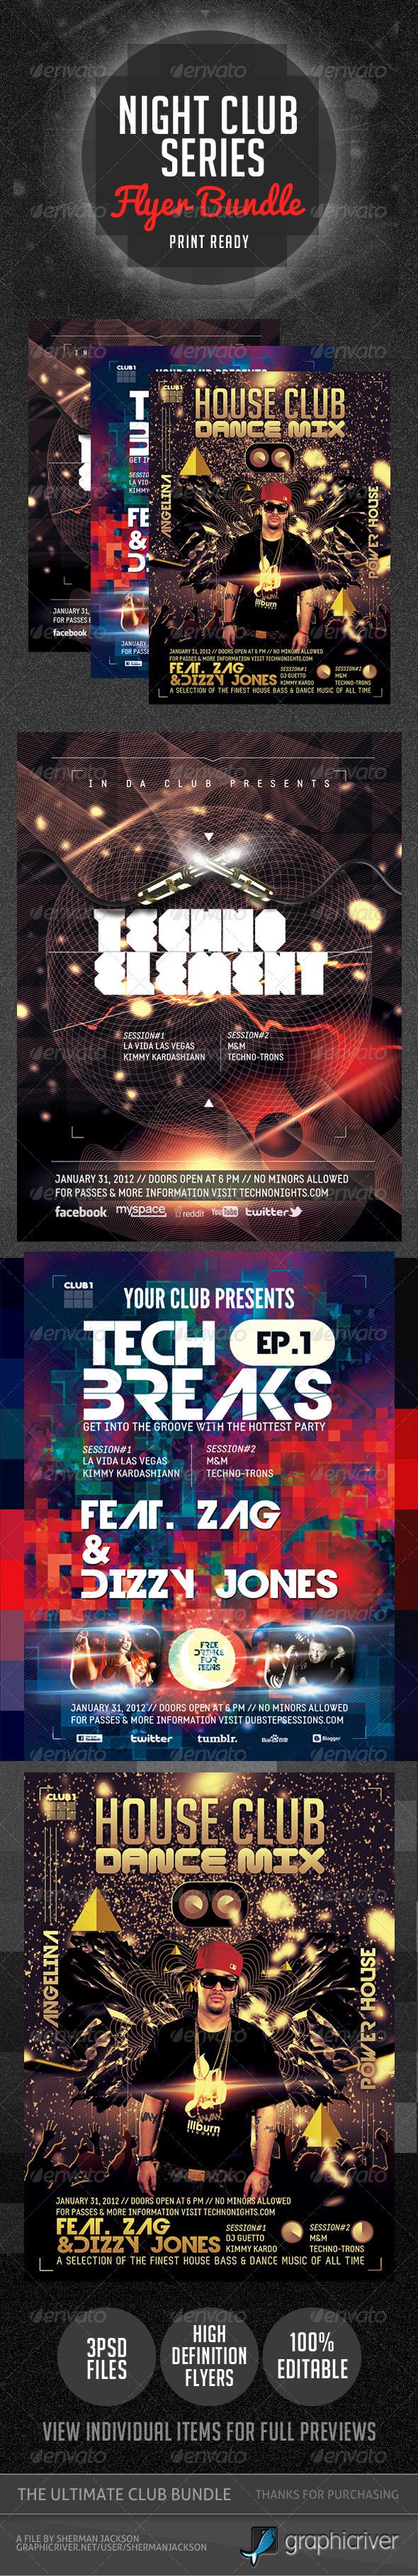 GraphicRiver Night Club Series Flyer Bundle V.1 4580411